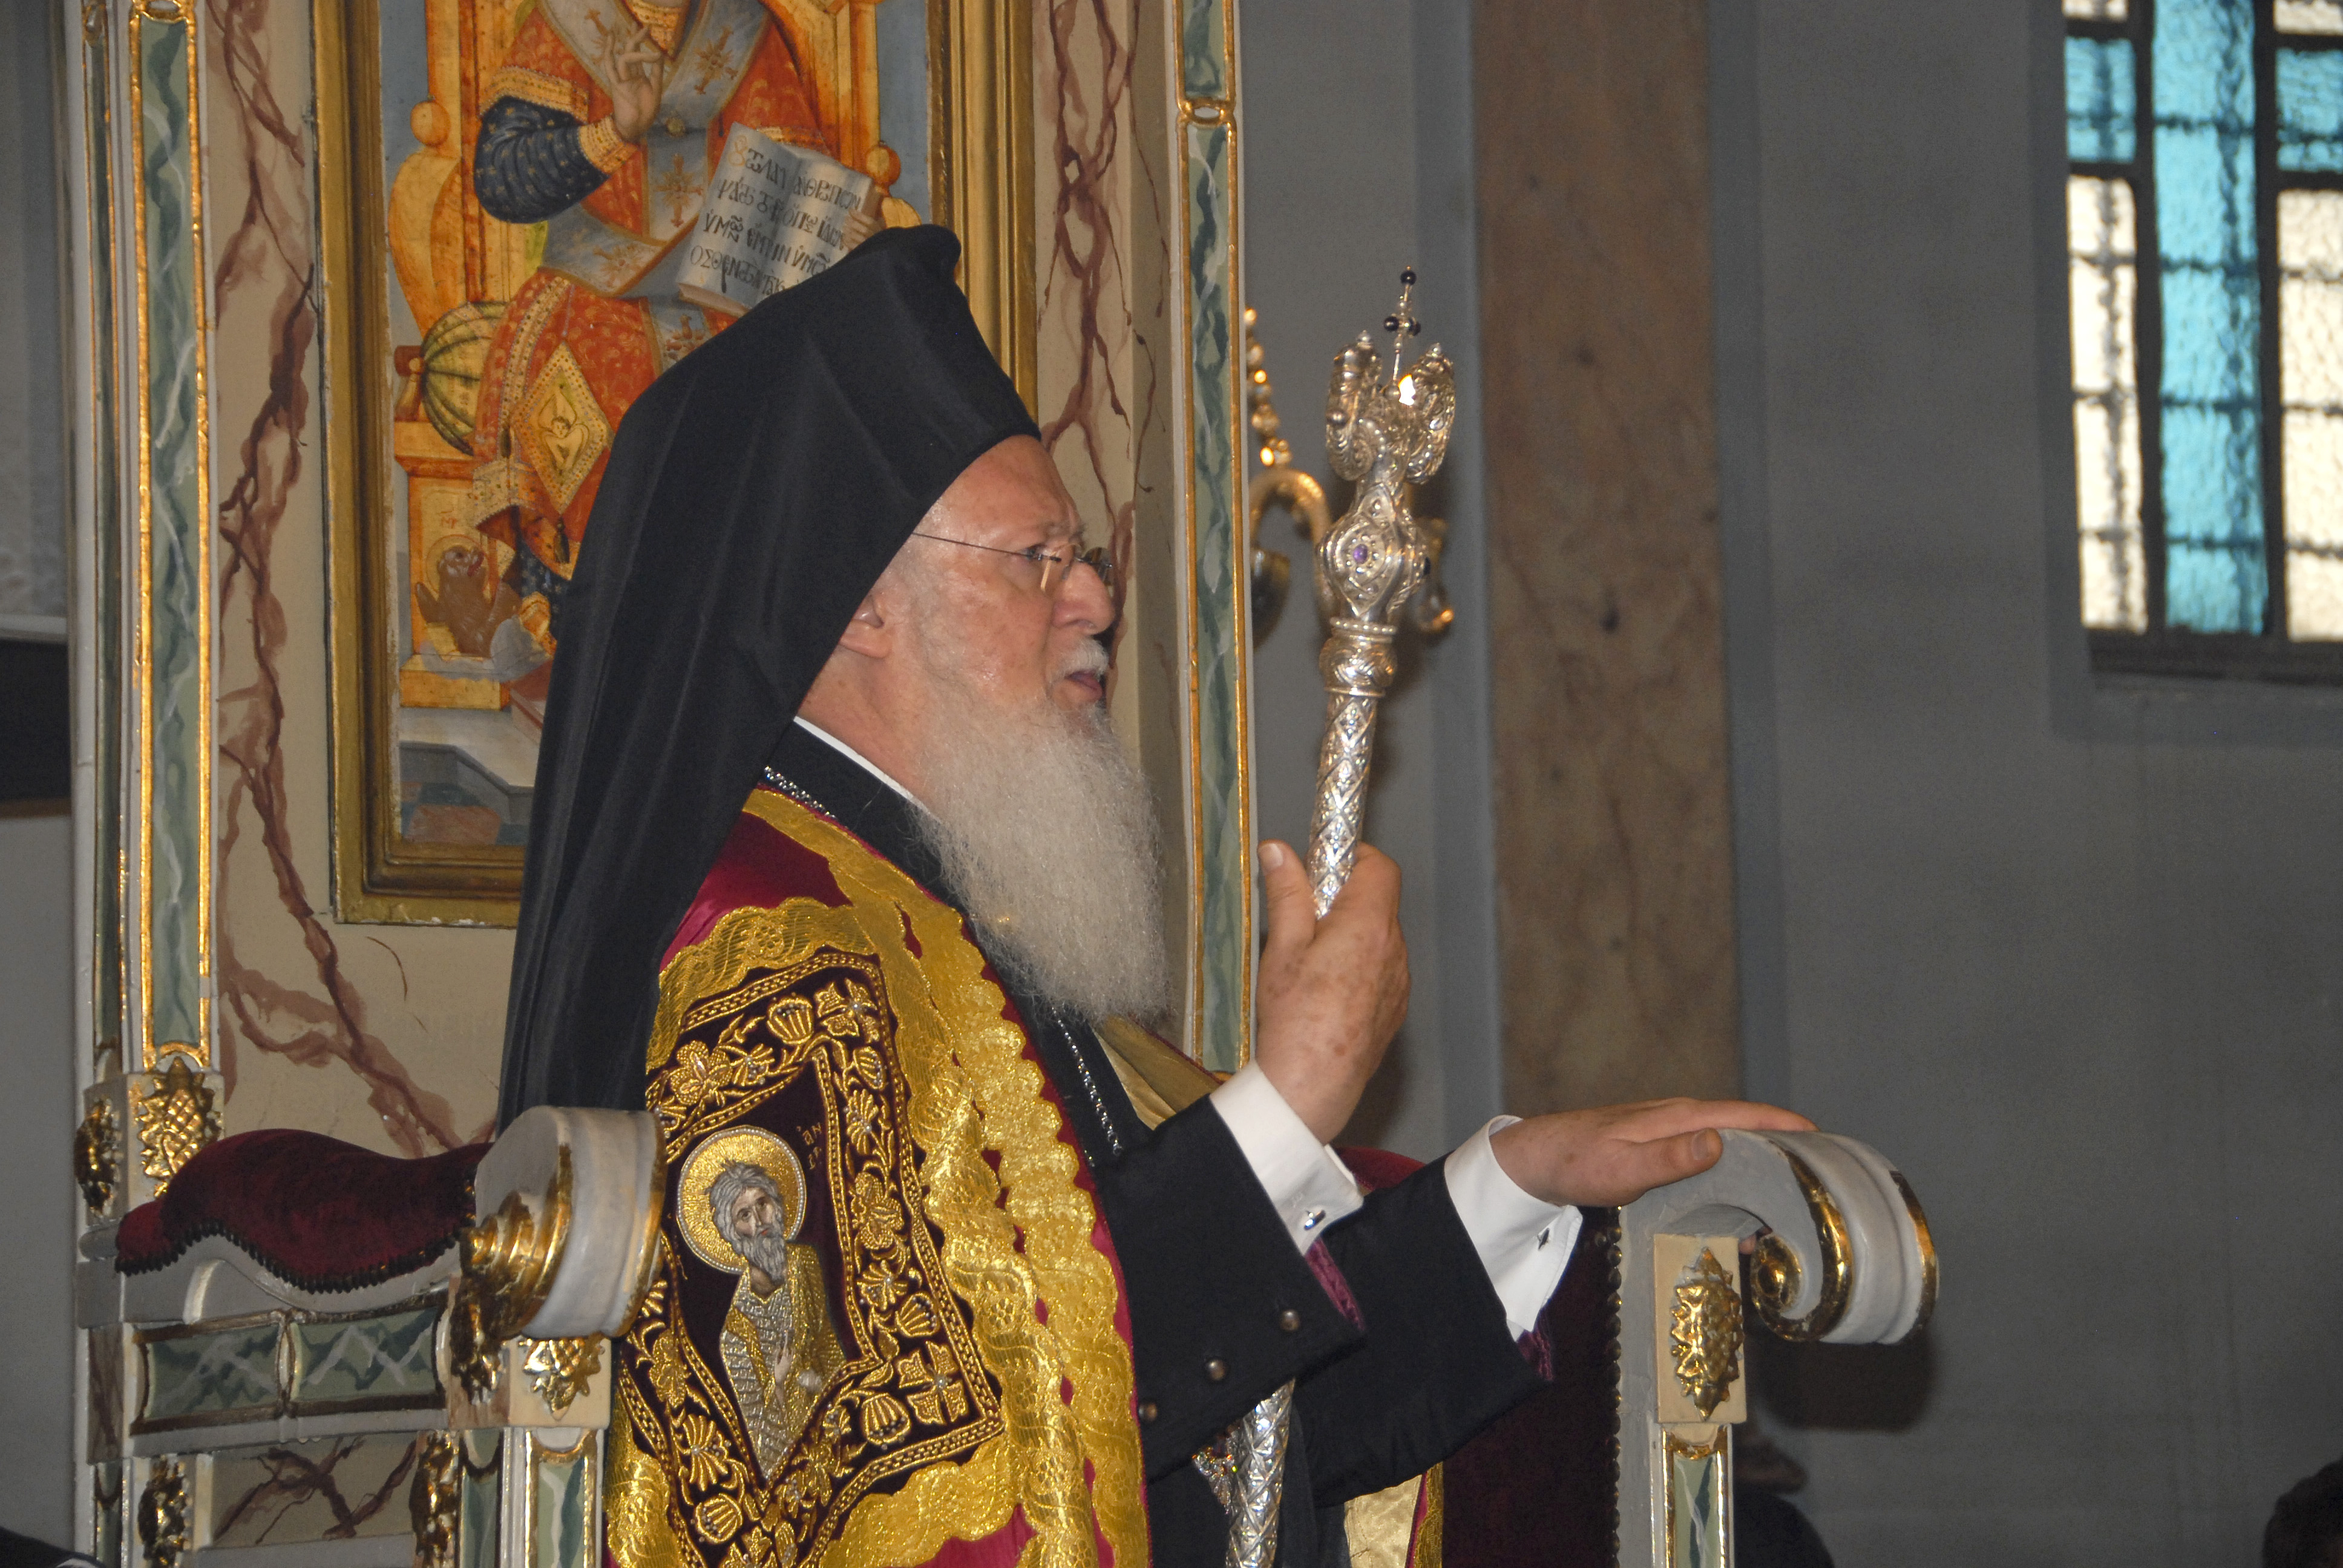 El patriarca Bartolomé I (Foto: Nikolaos Manginas - Patriarcado Ecuménico)